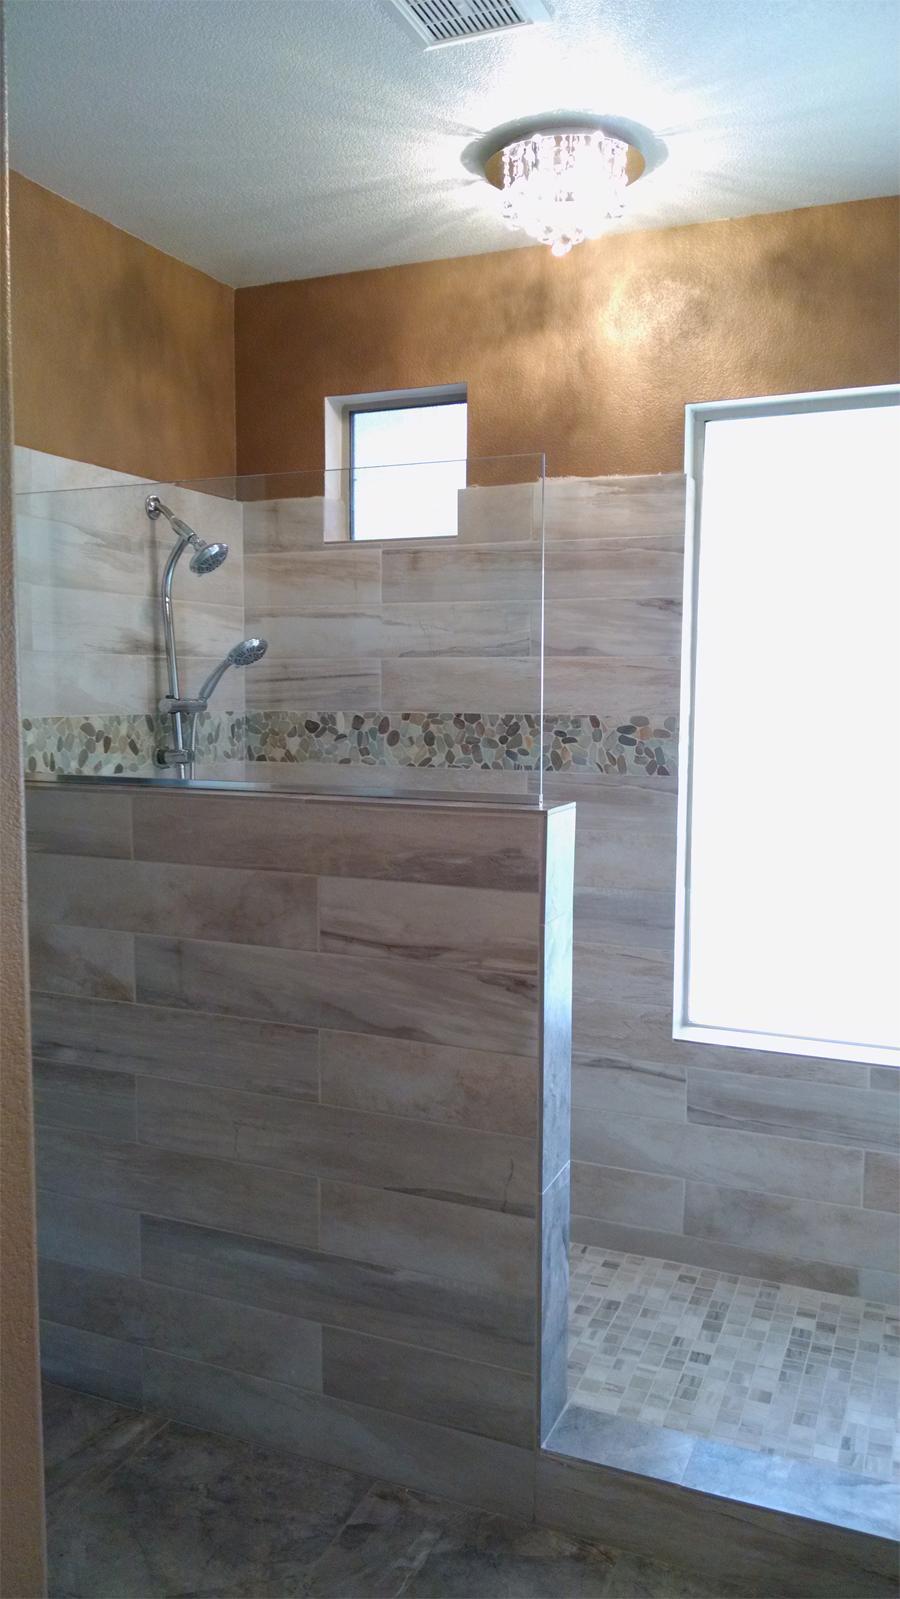 Kitchen Remodeling Phoenix Az Kitchen Remodeling Phoenix Az Bathroom Remodeling  Phoenix Az